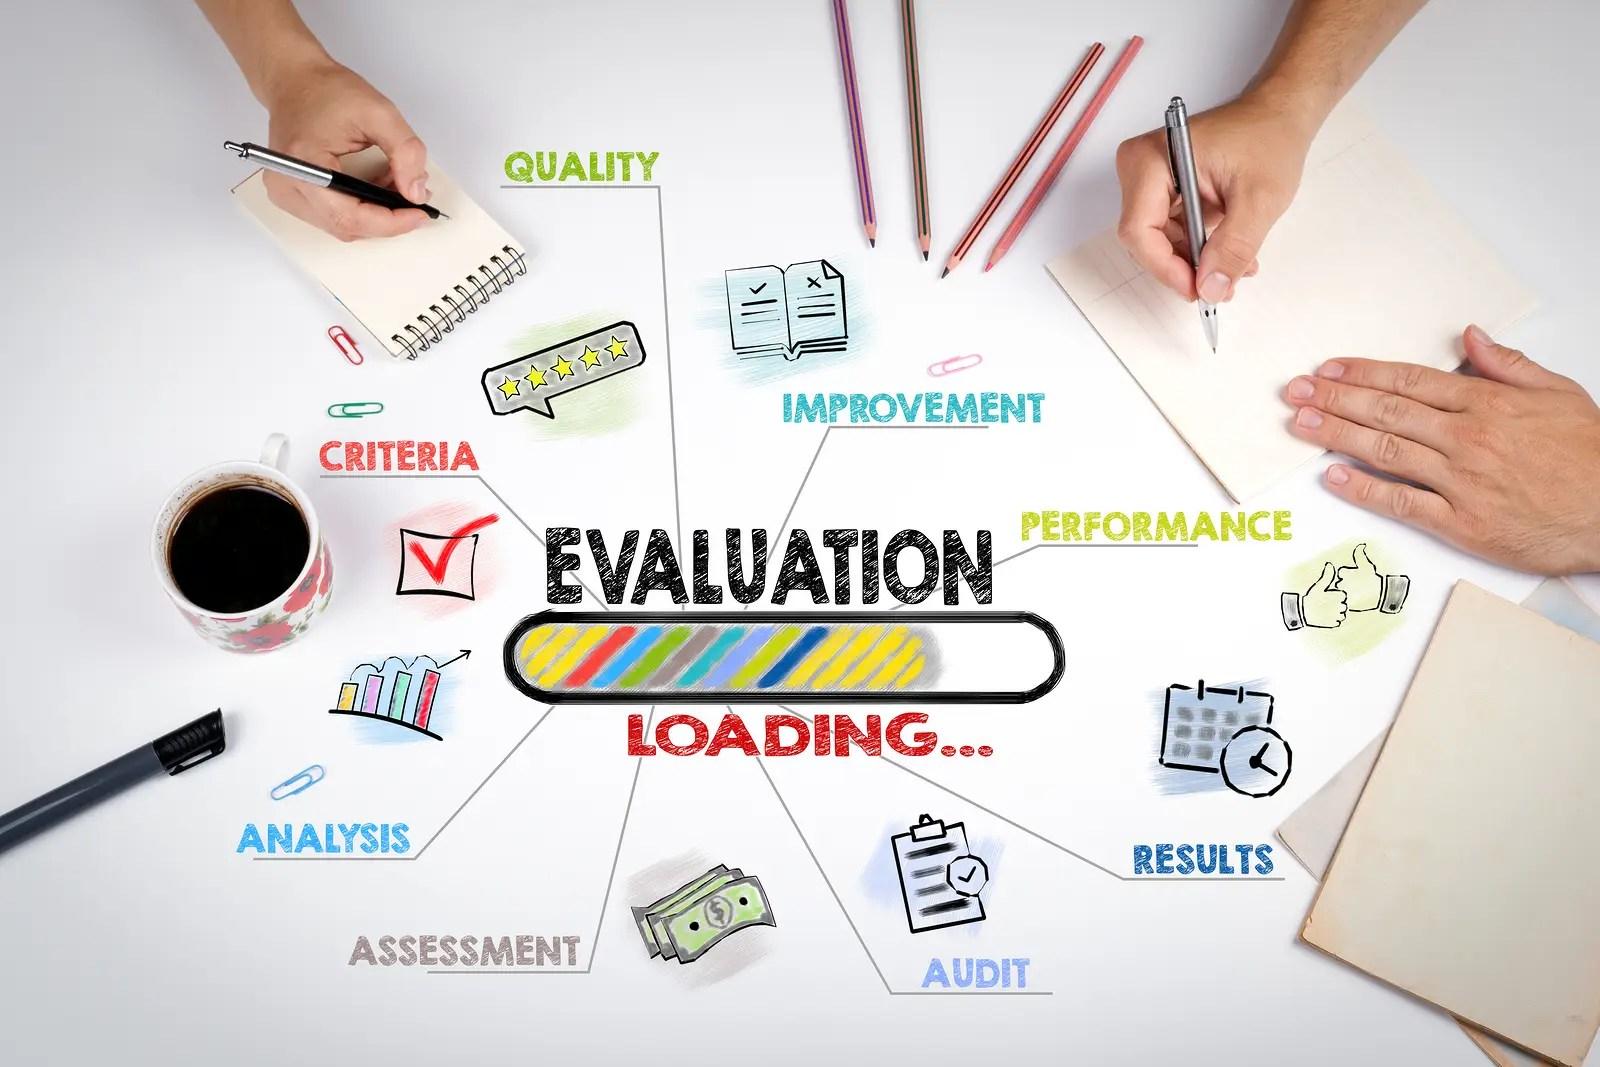 evaluation concept by online business reputation management